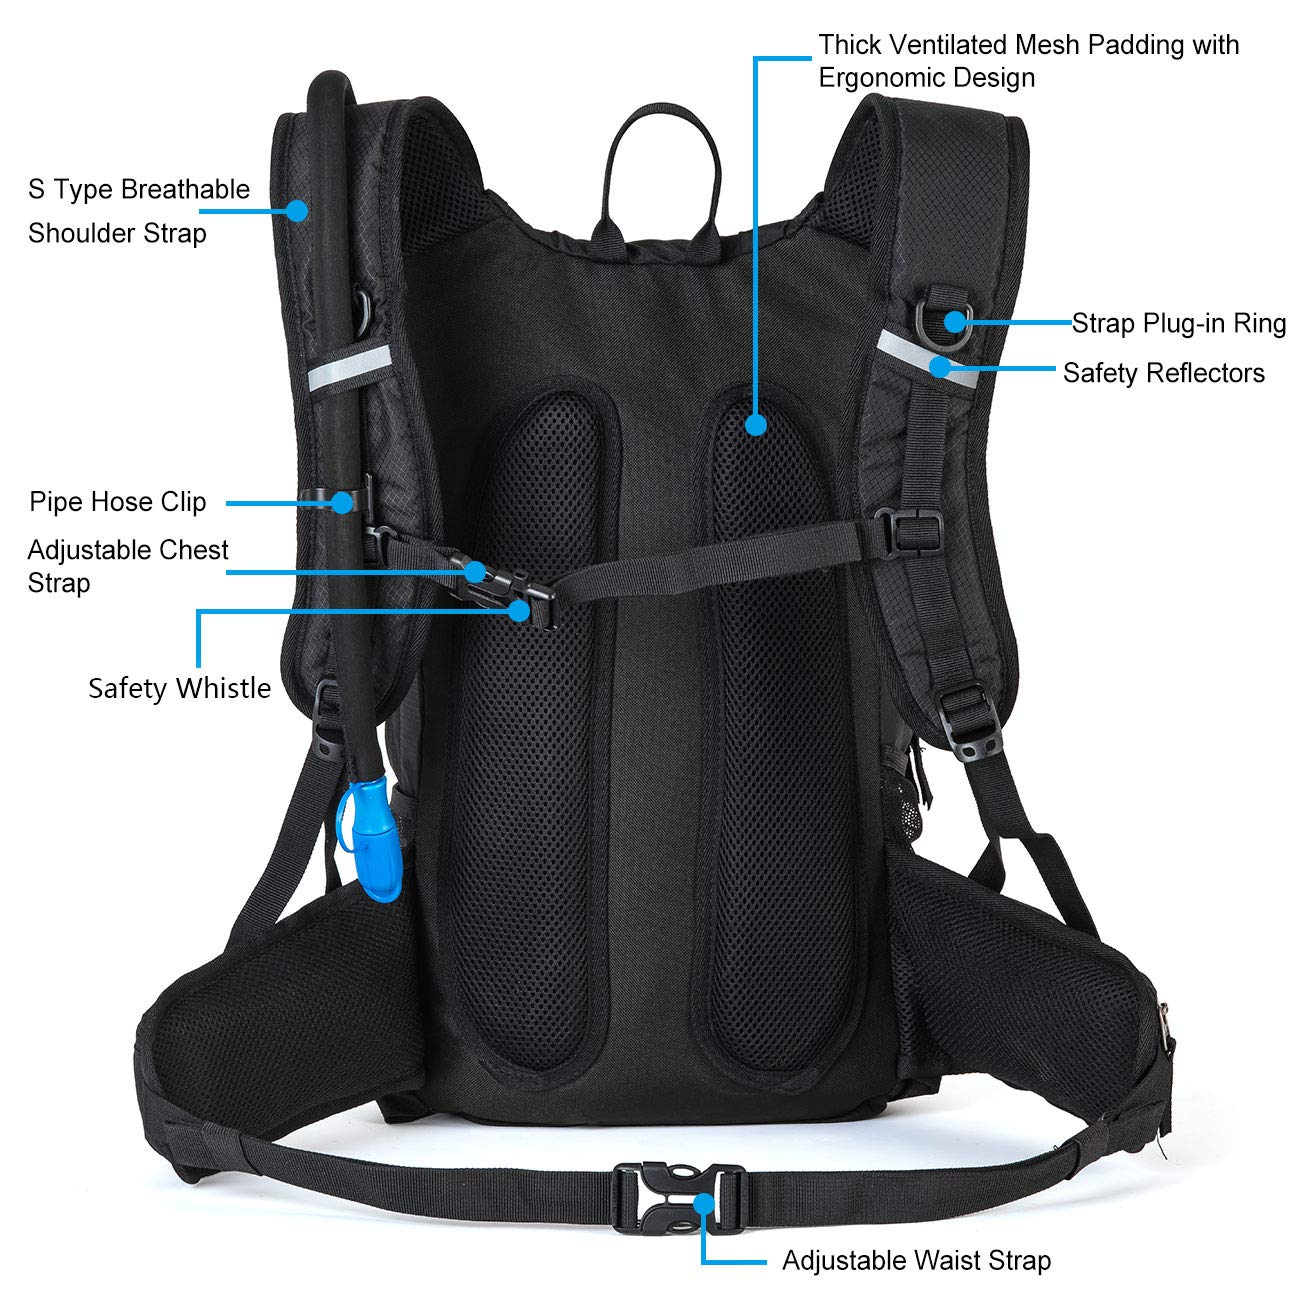 Orange Mud Gear Vest 2.0 Hydration Pack 1L Bladder Super Breathable, Lightweight Durable Hydrating Backpack Runner, Bikers, Sports, Outdoor Adventures More